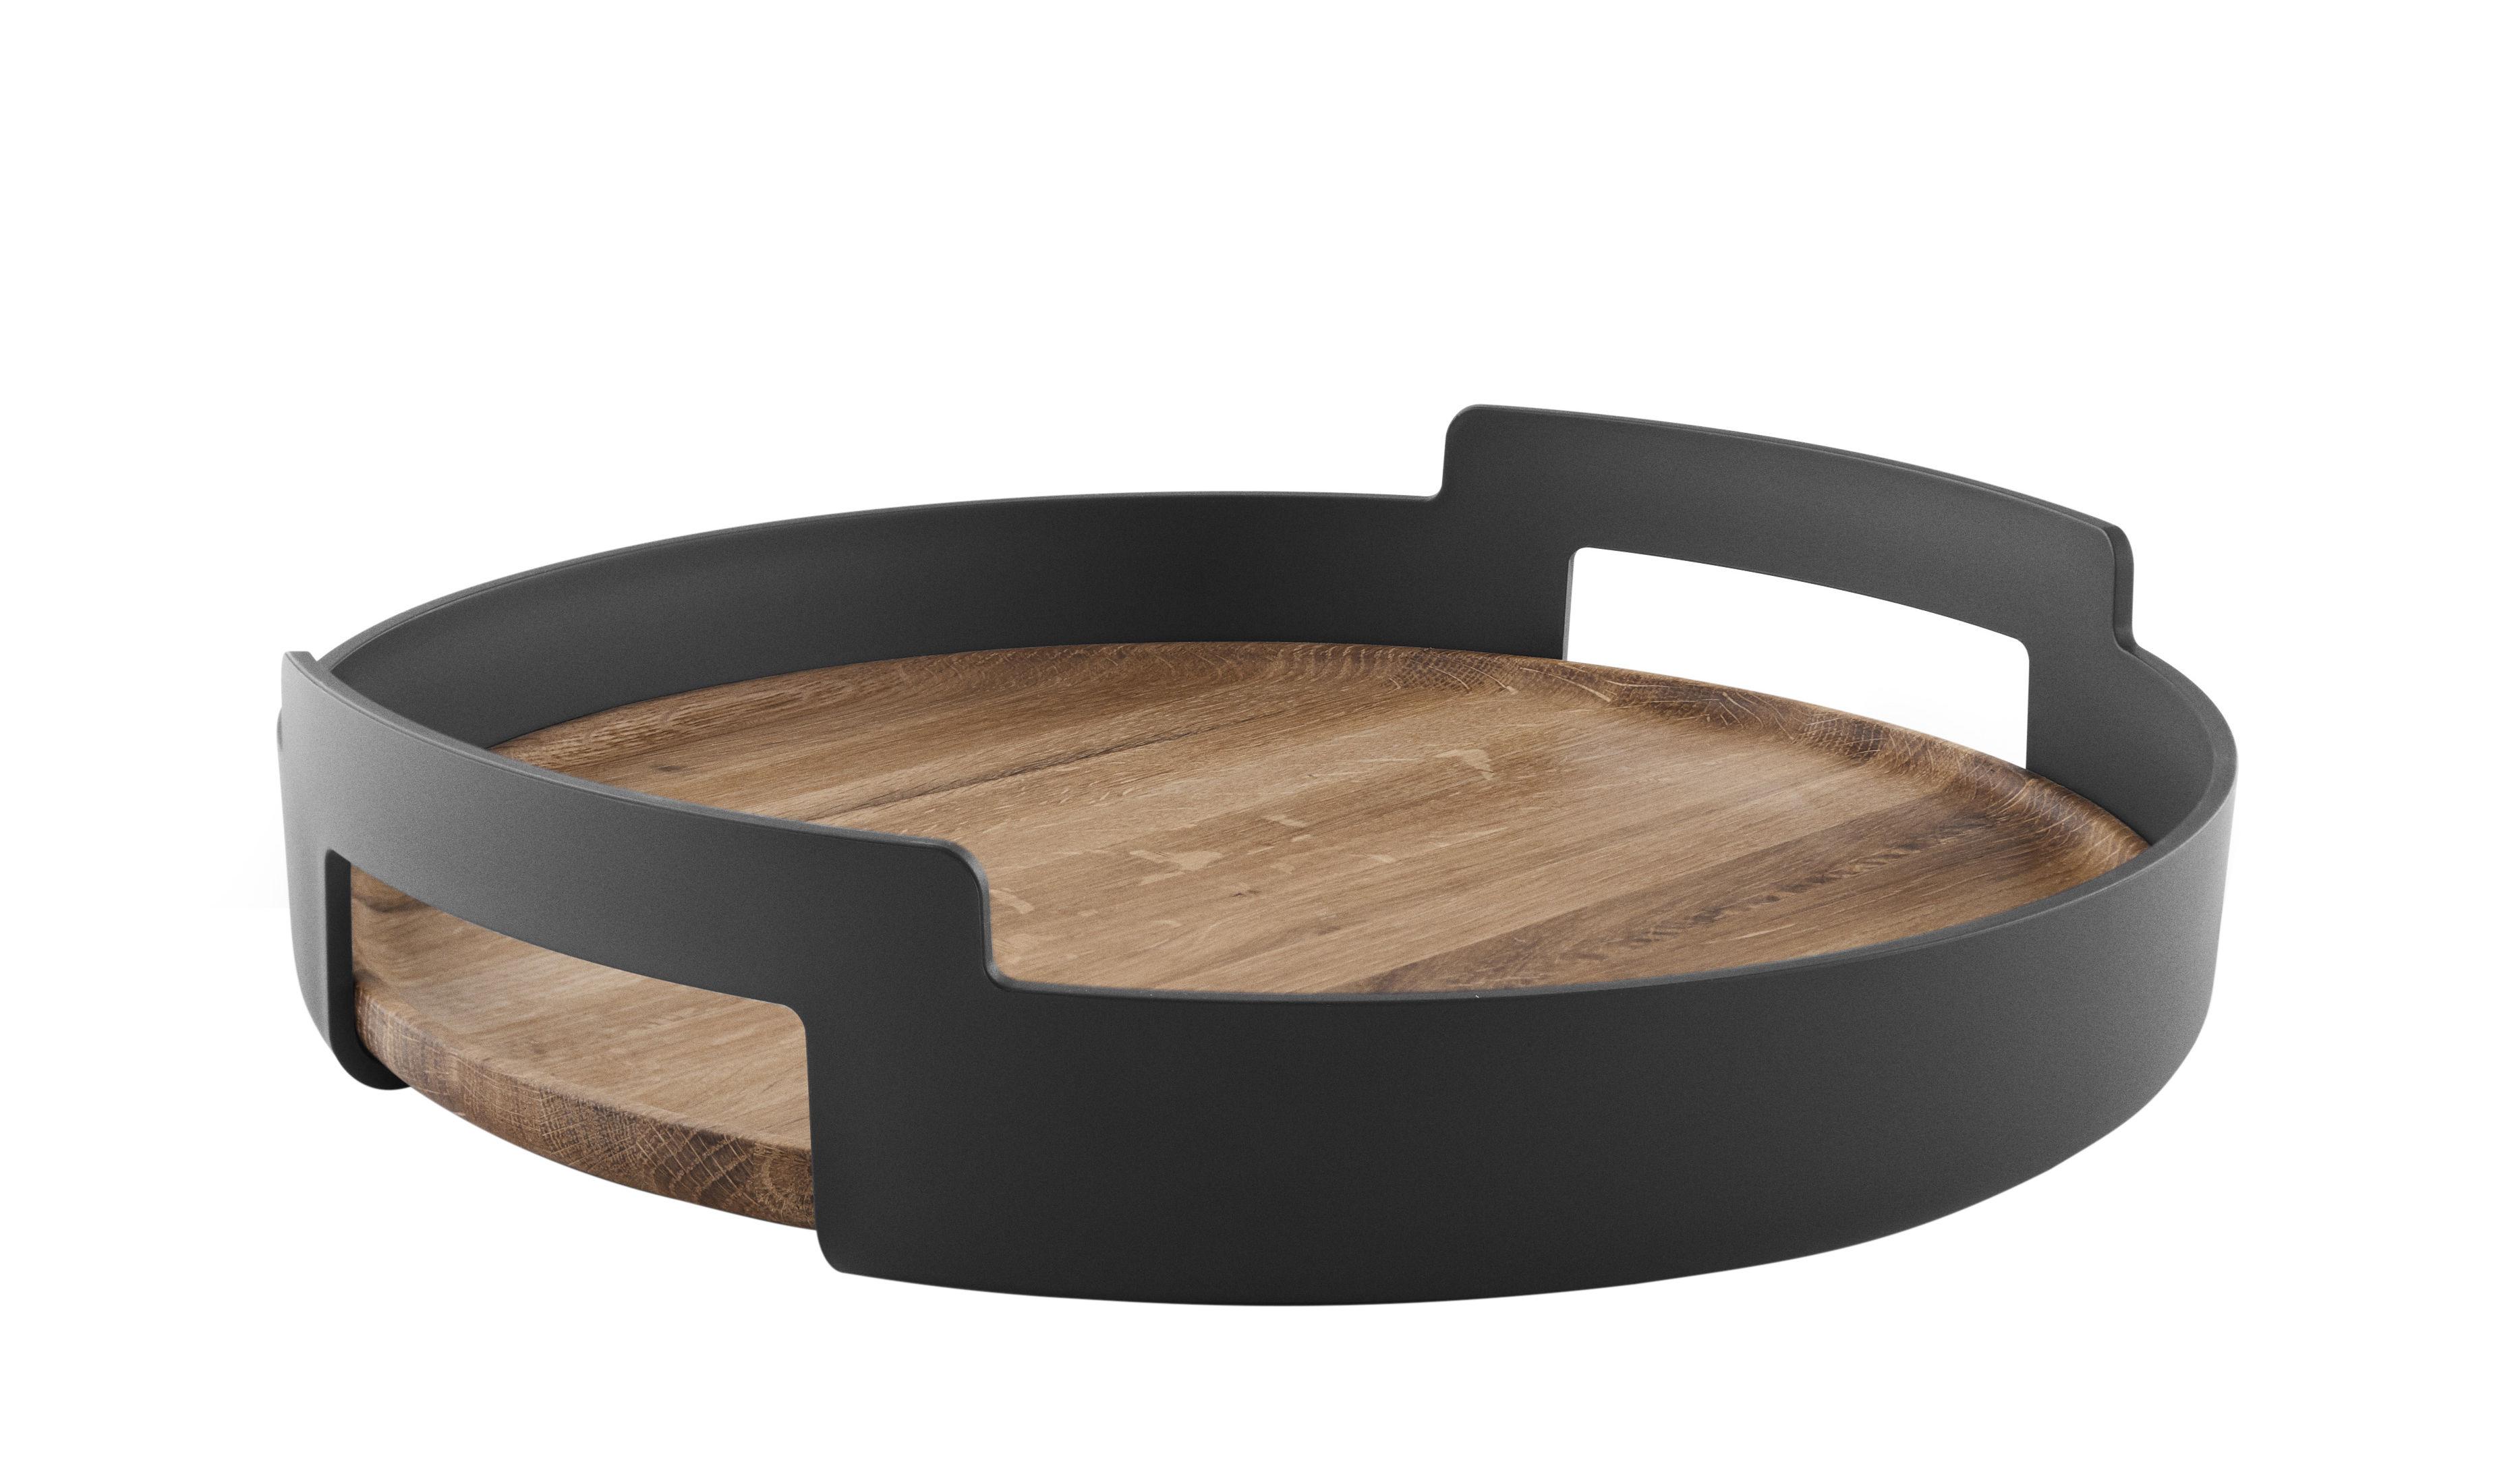 Tischkultur - Tabletts - Nordic Kitchen Tablett / Ø 35 cm - Eva Solo - Schwarz matt & Eiche natur - massive Eiche, Polypropylen